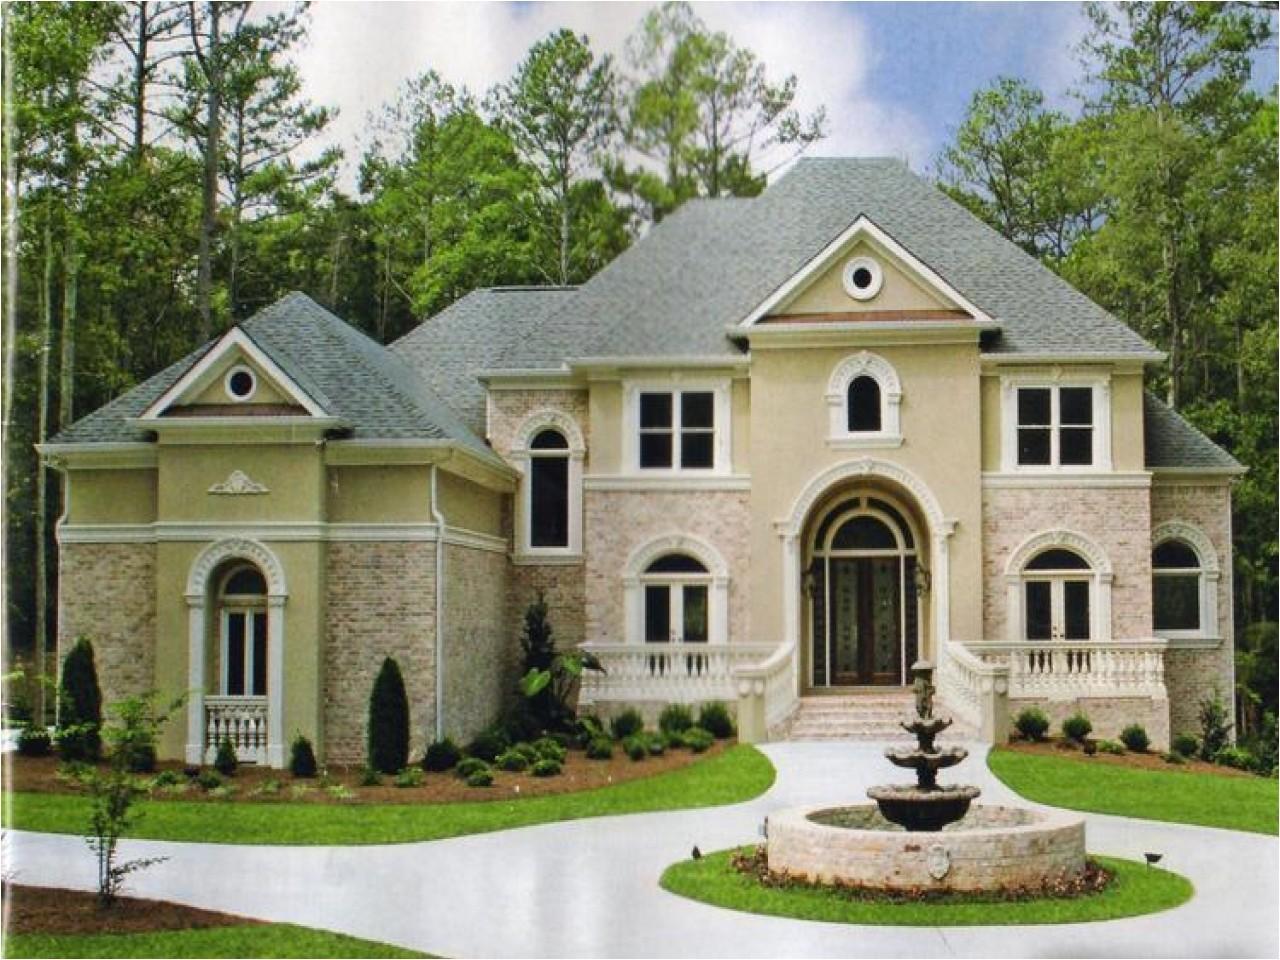 e4369651e6b50077 best luxury house plans rustic luxury mountain house plans